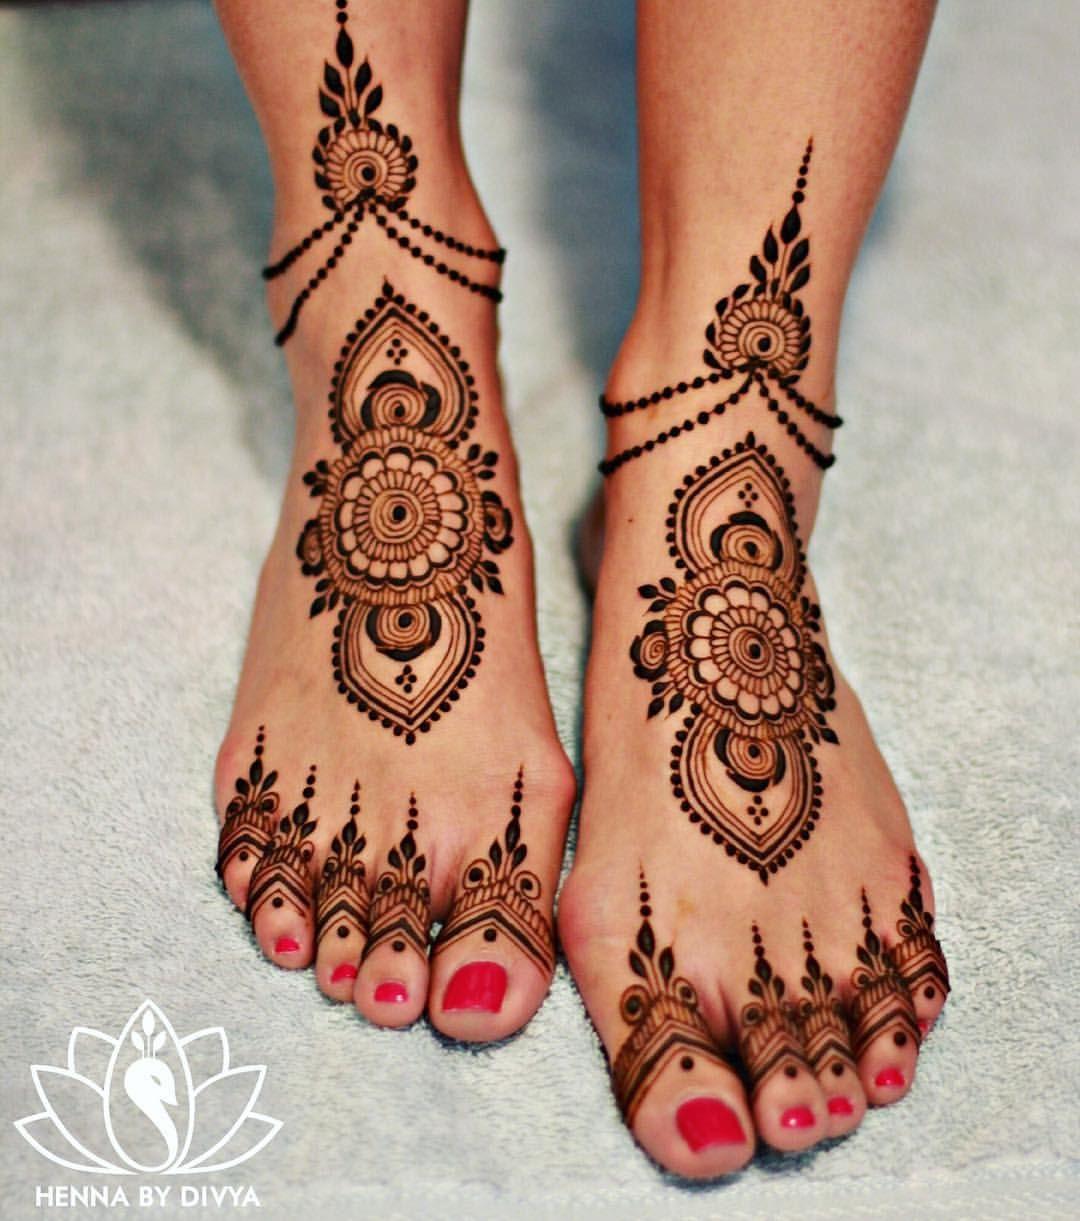 Pin by A ZA on Henna \u0026 Tattoos